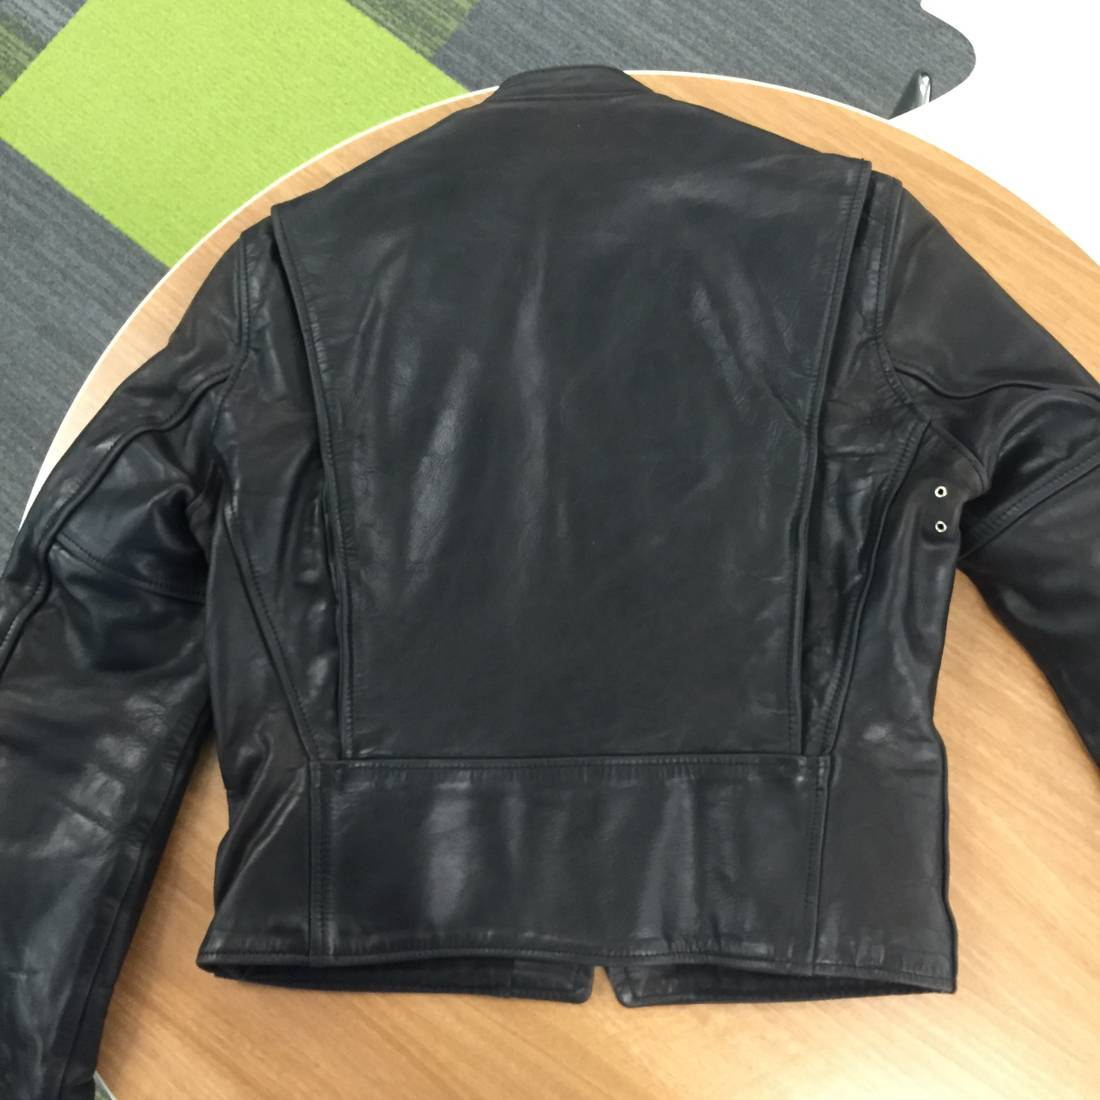 ... Aero Leather FQHH Cafe Racer 40 Size US M / EU 48-50 / 2 ...